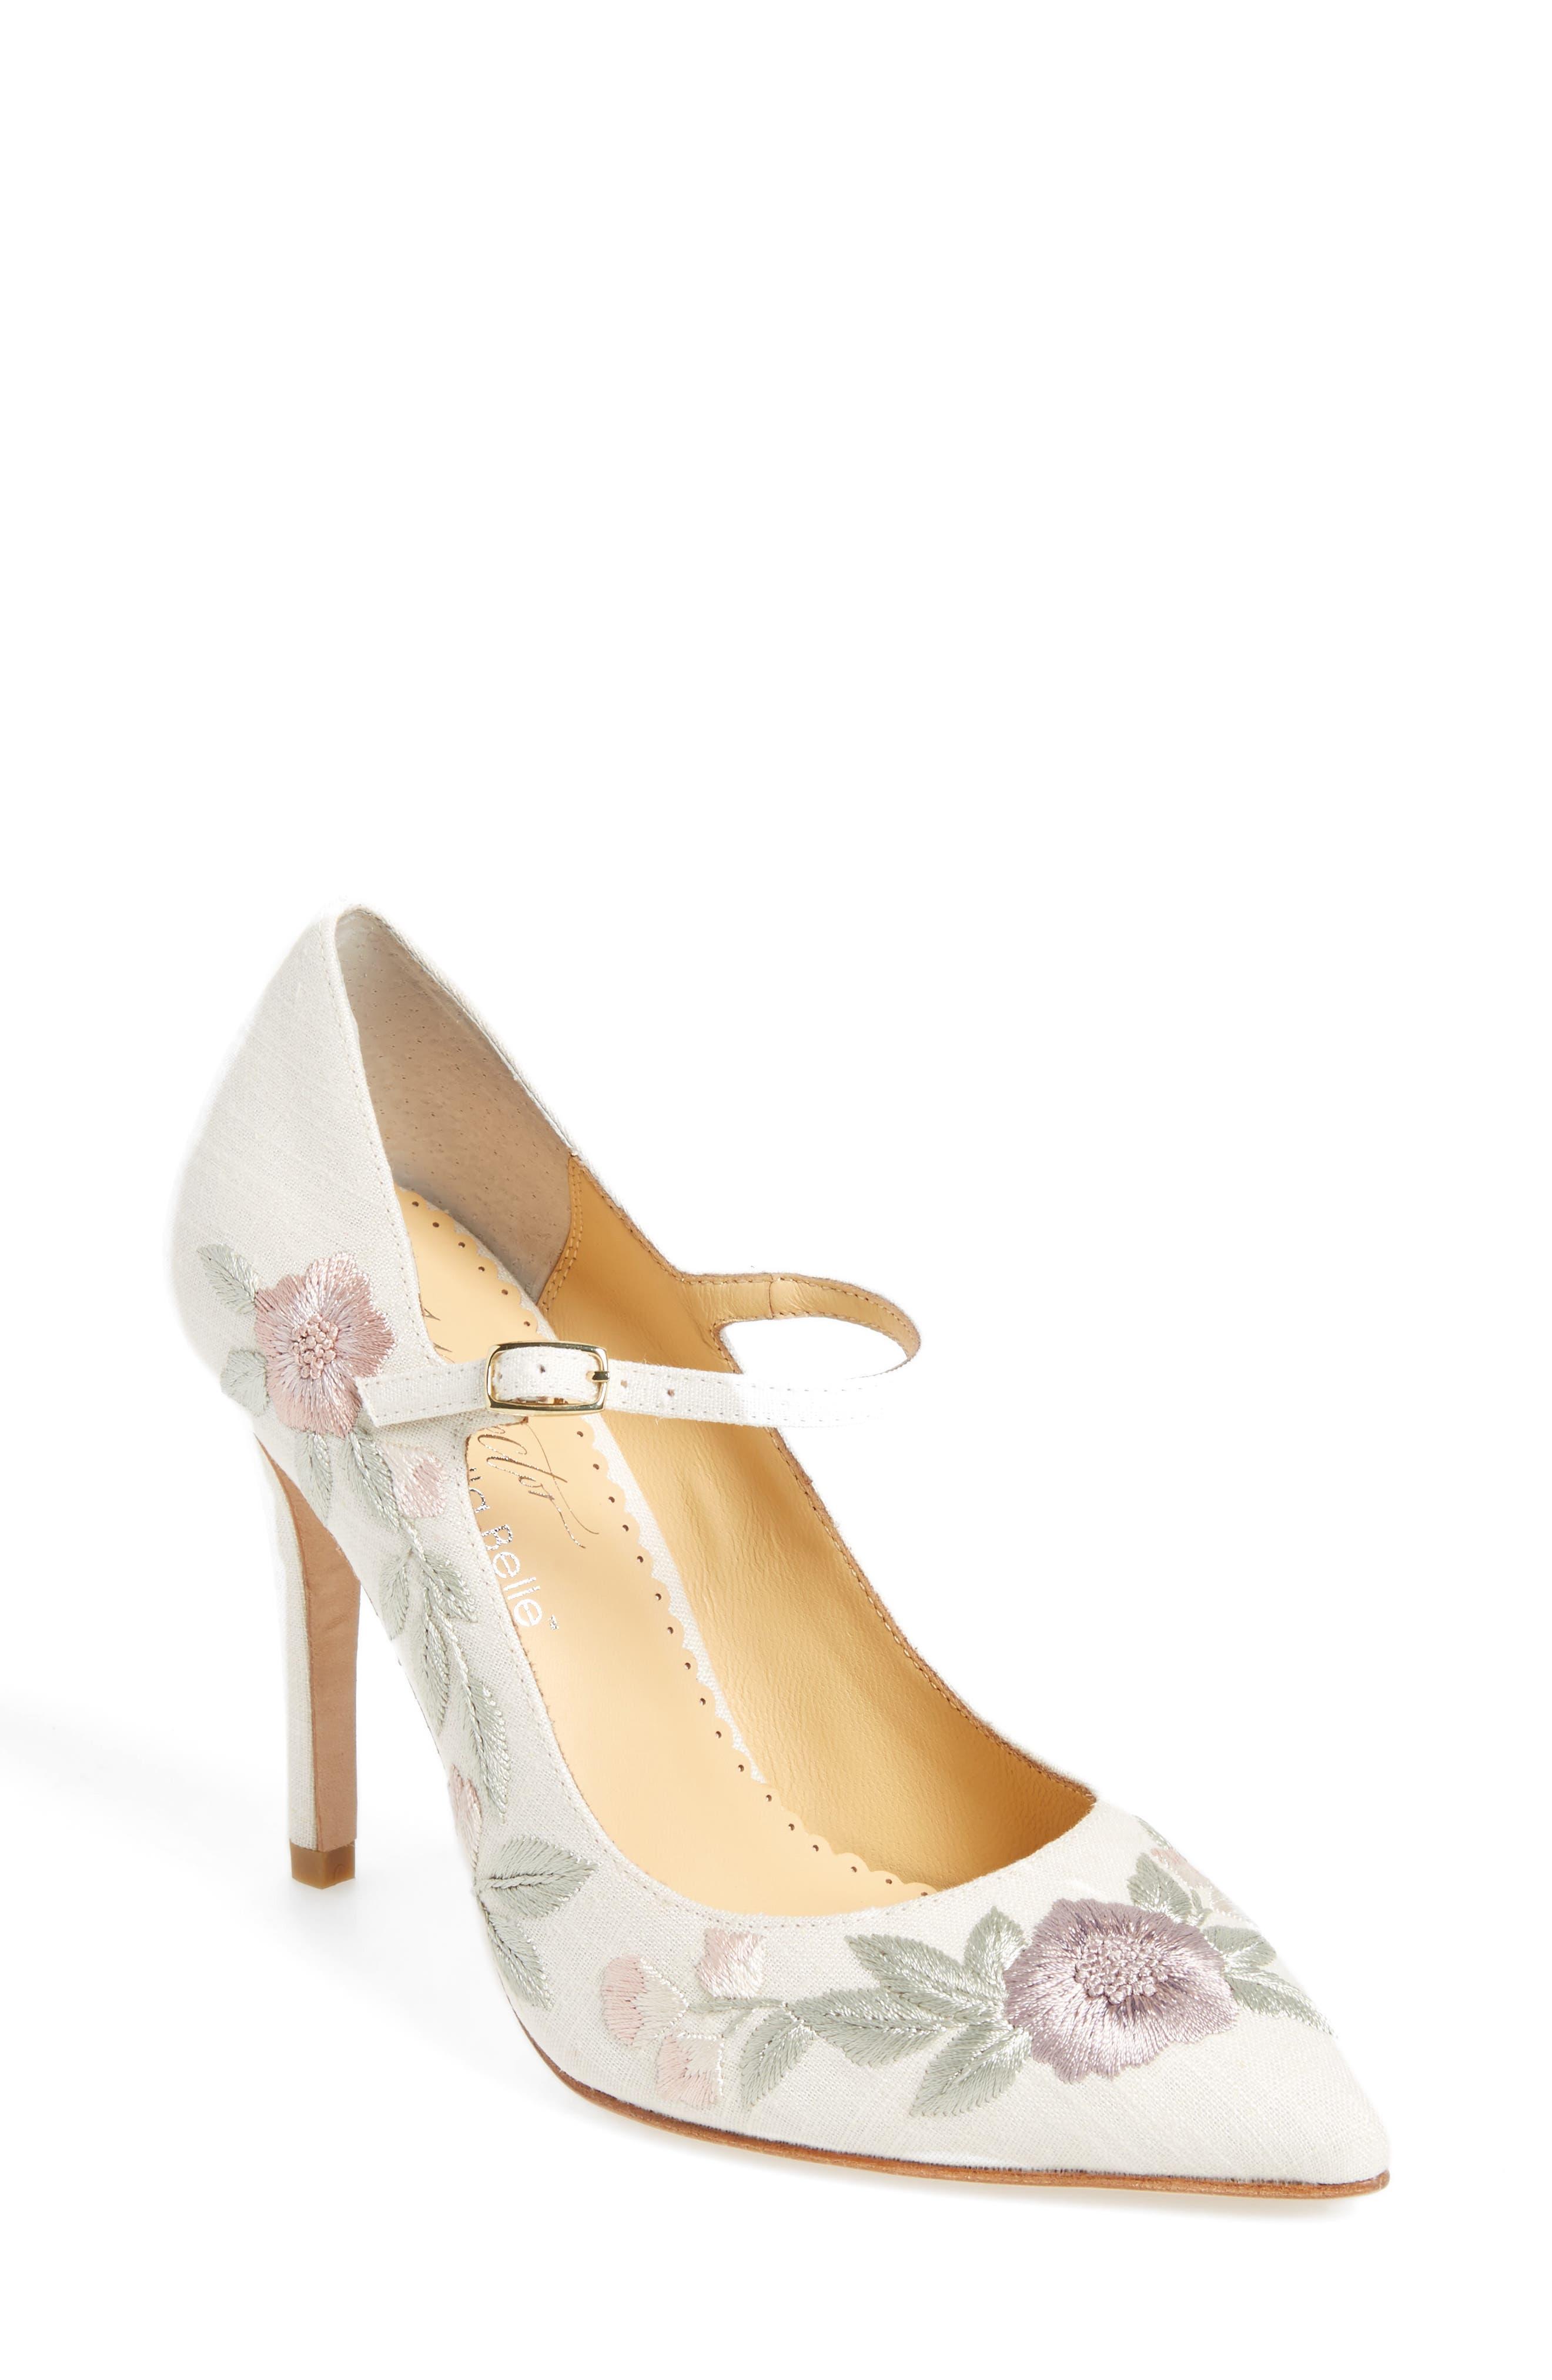 7b6e19cd4280 Women s Pumps Wedding Shoes